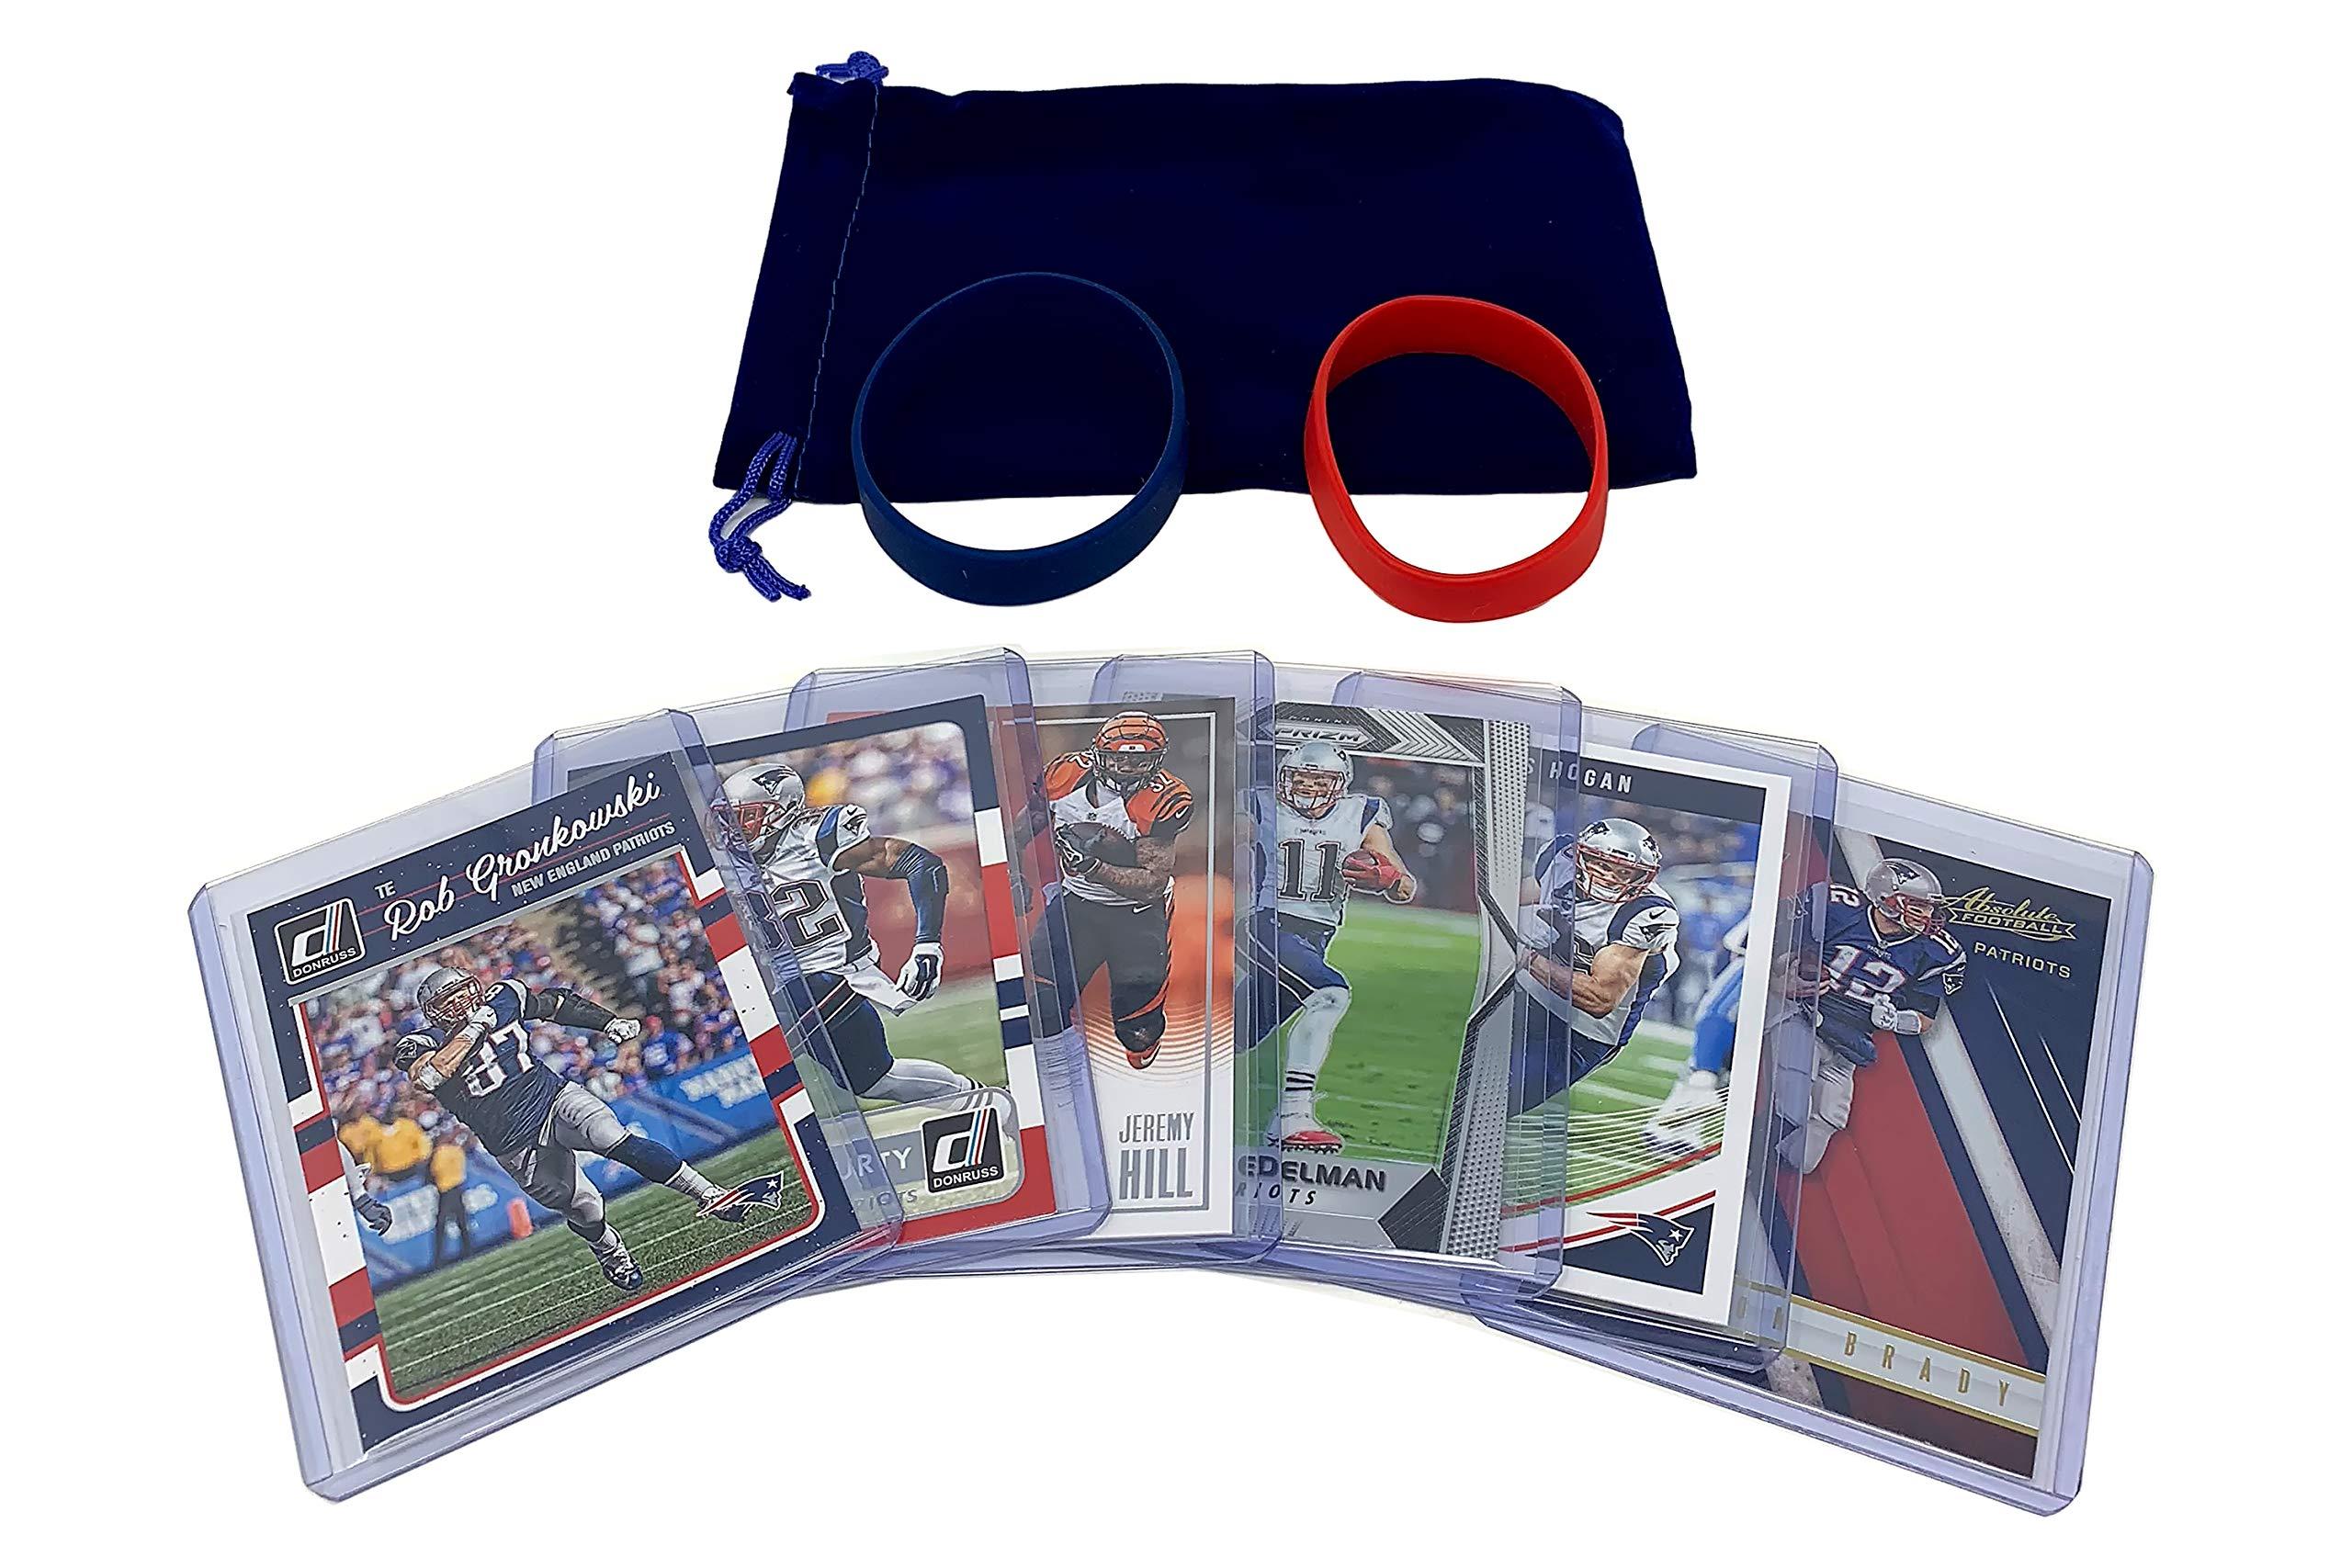 New England Patriots Cards: Tom Brady, Rob Gronkowski, Chris Hogan, Devin McCourty, Jeremy Hill, Julian Edelman ASSORTED Trading Cards and Wristbands Bundle